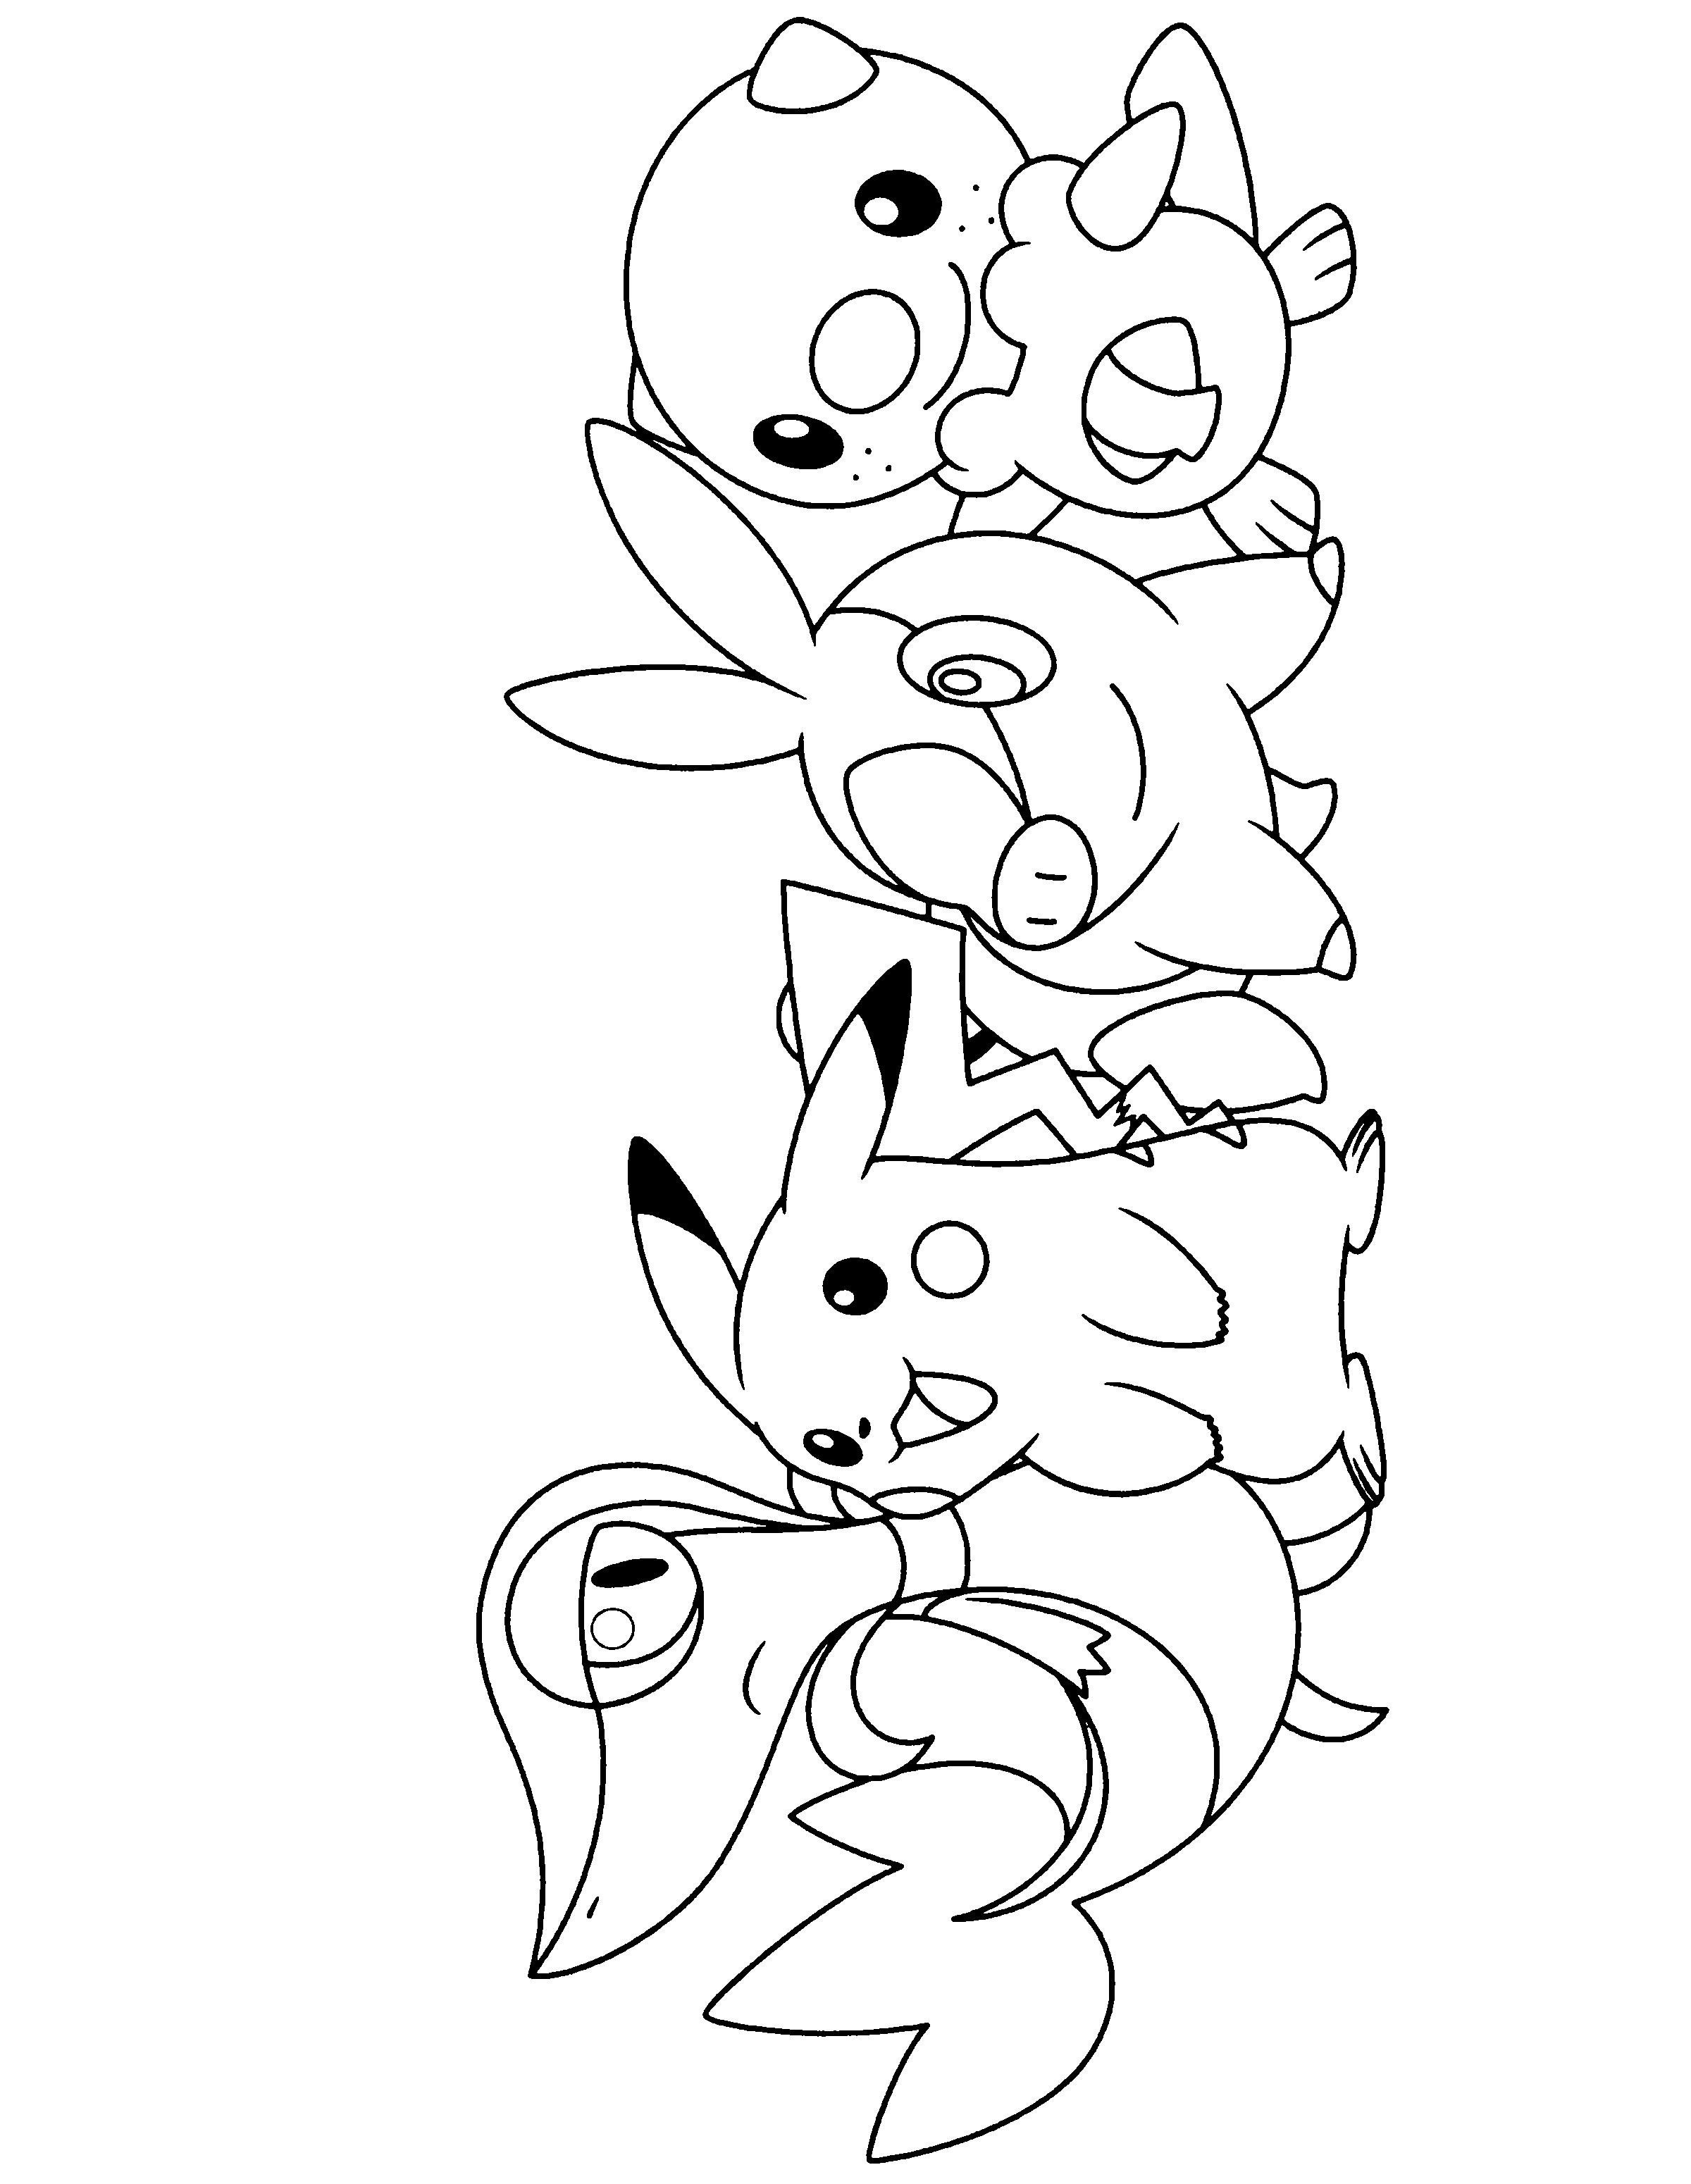 Pokemon Black And White Printable Coloring Pages Pokemon Coloring Pages Pokemon Coloring Pokemon Black And White